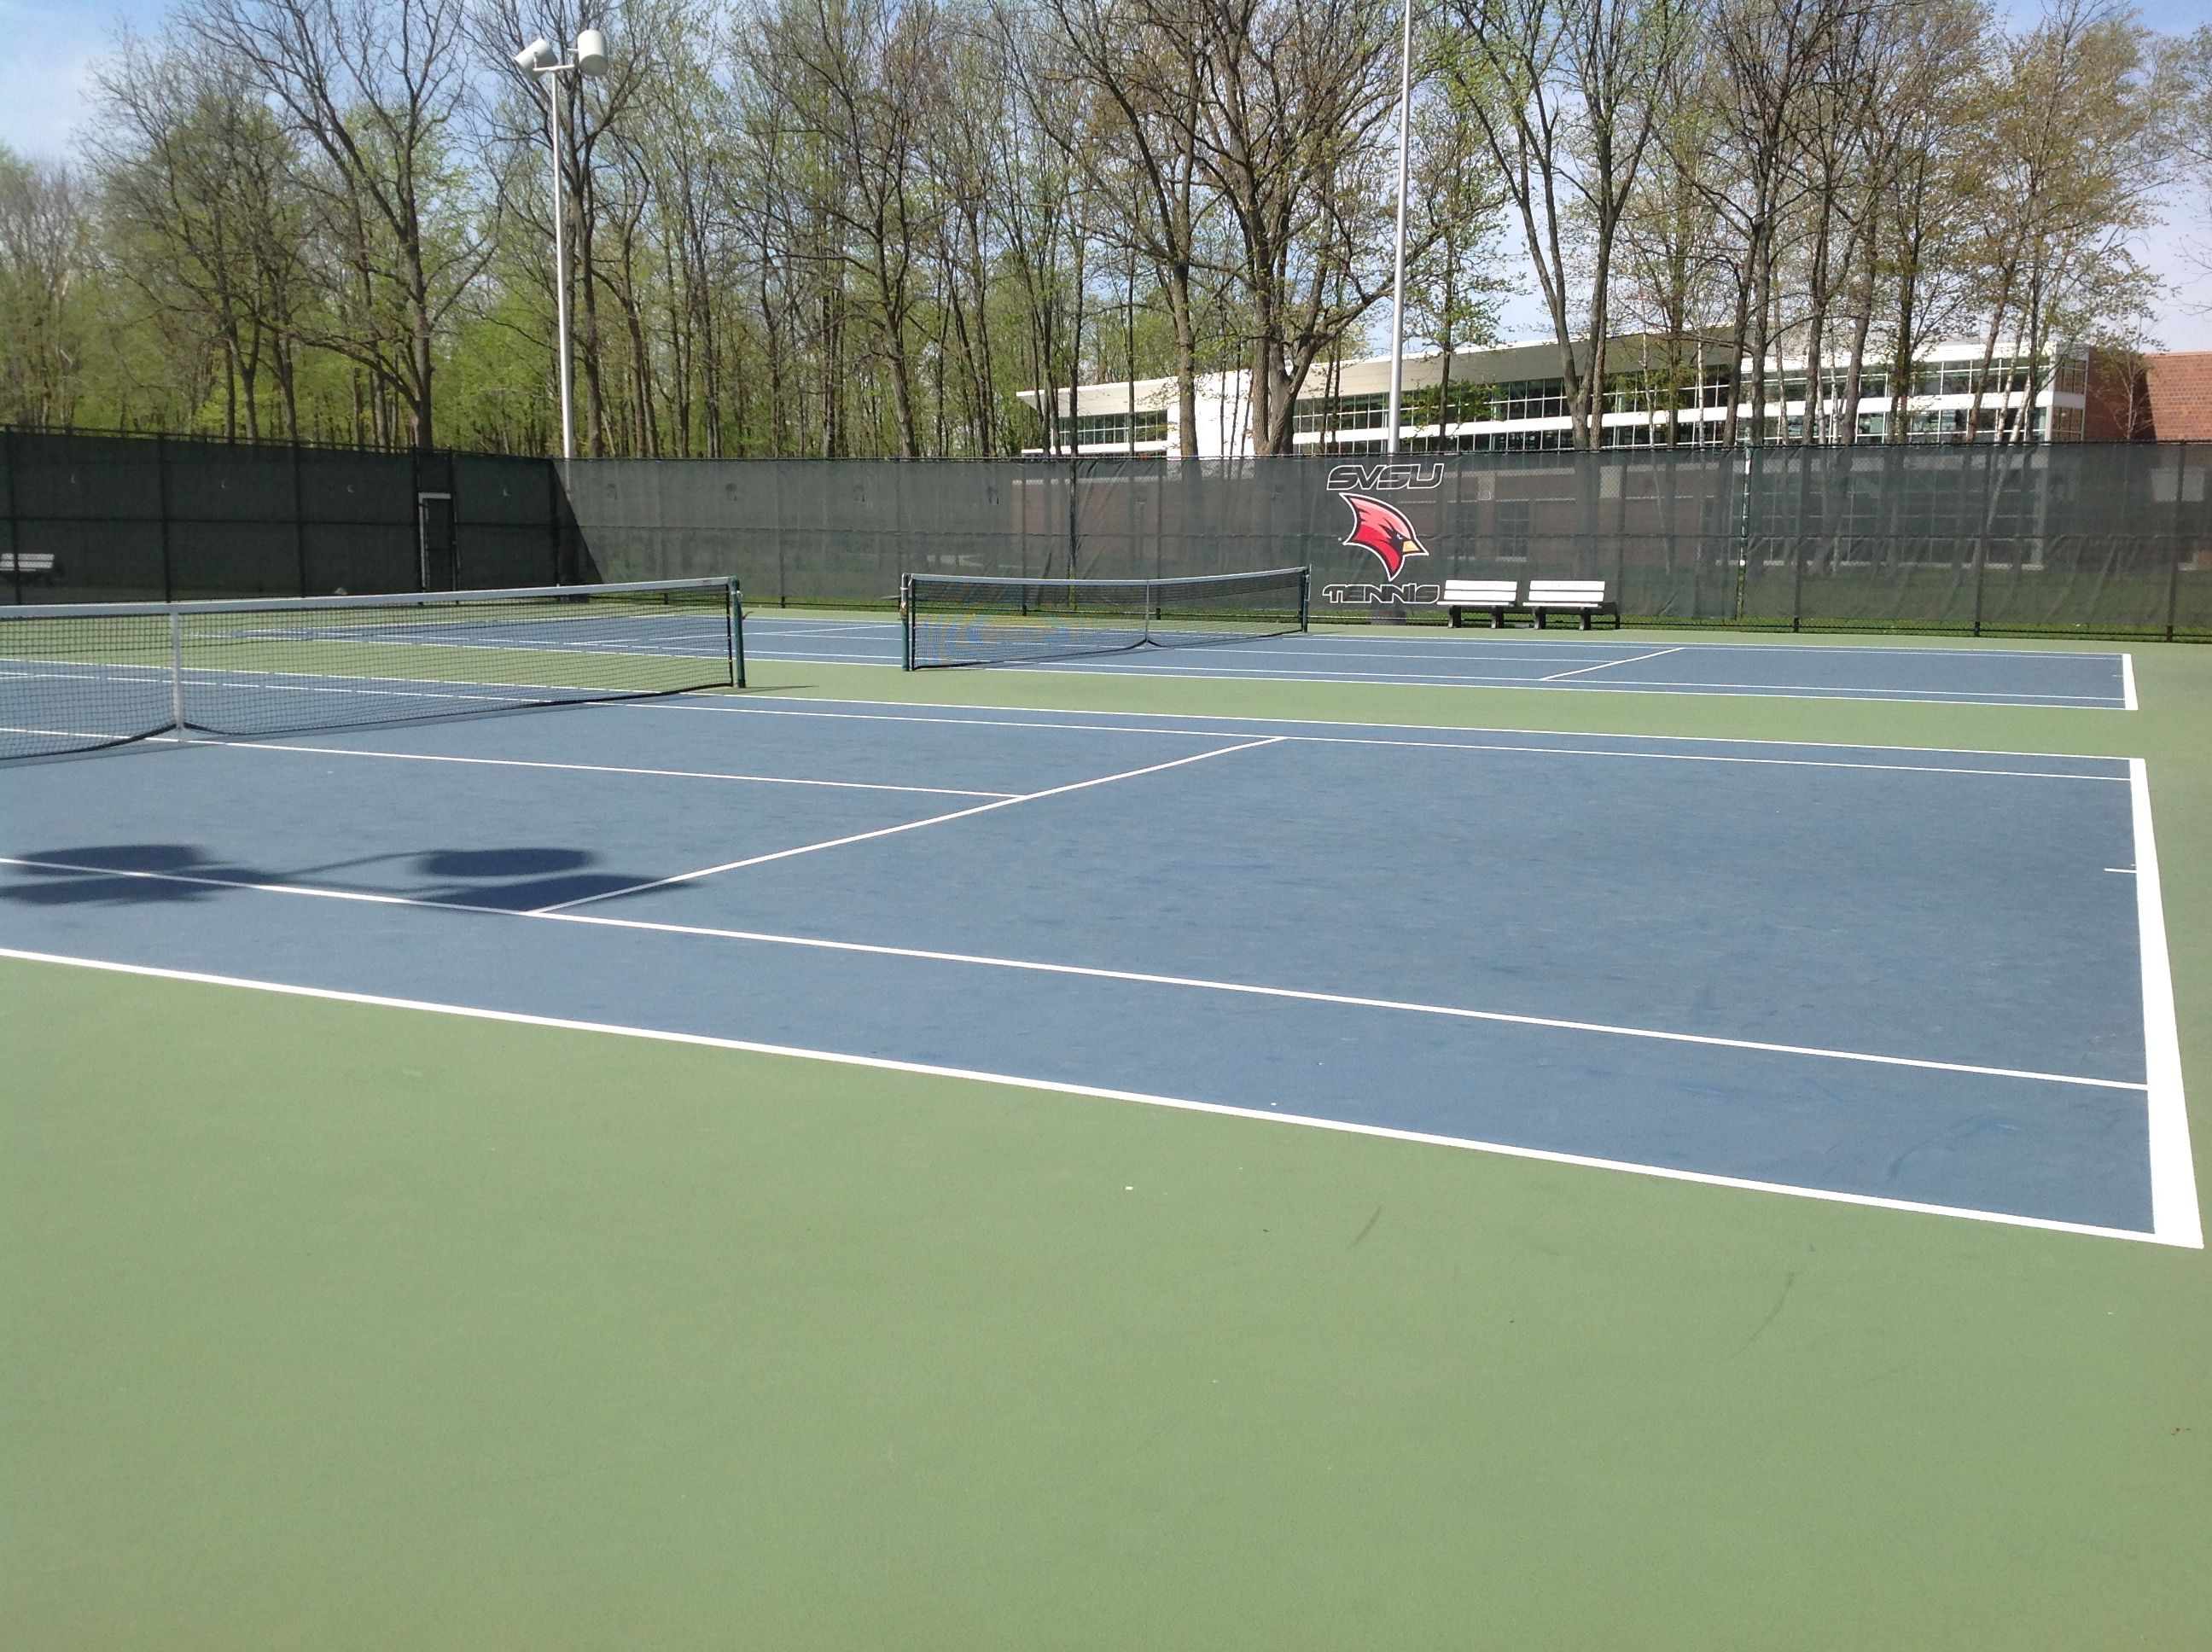 Svsu Tennis Courts Tennis Court Tennis Court